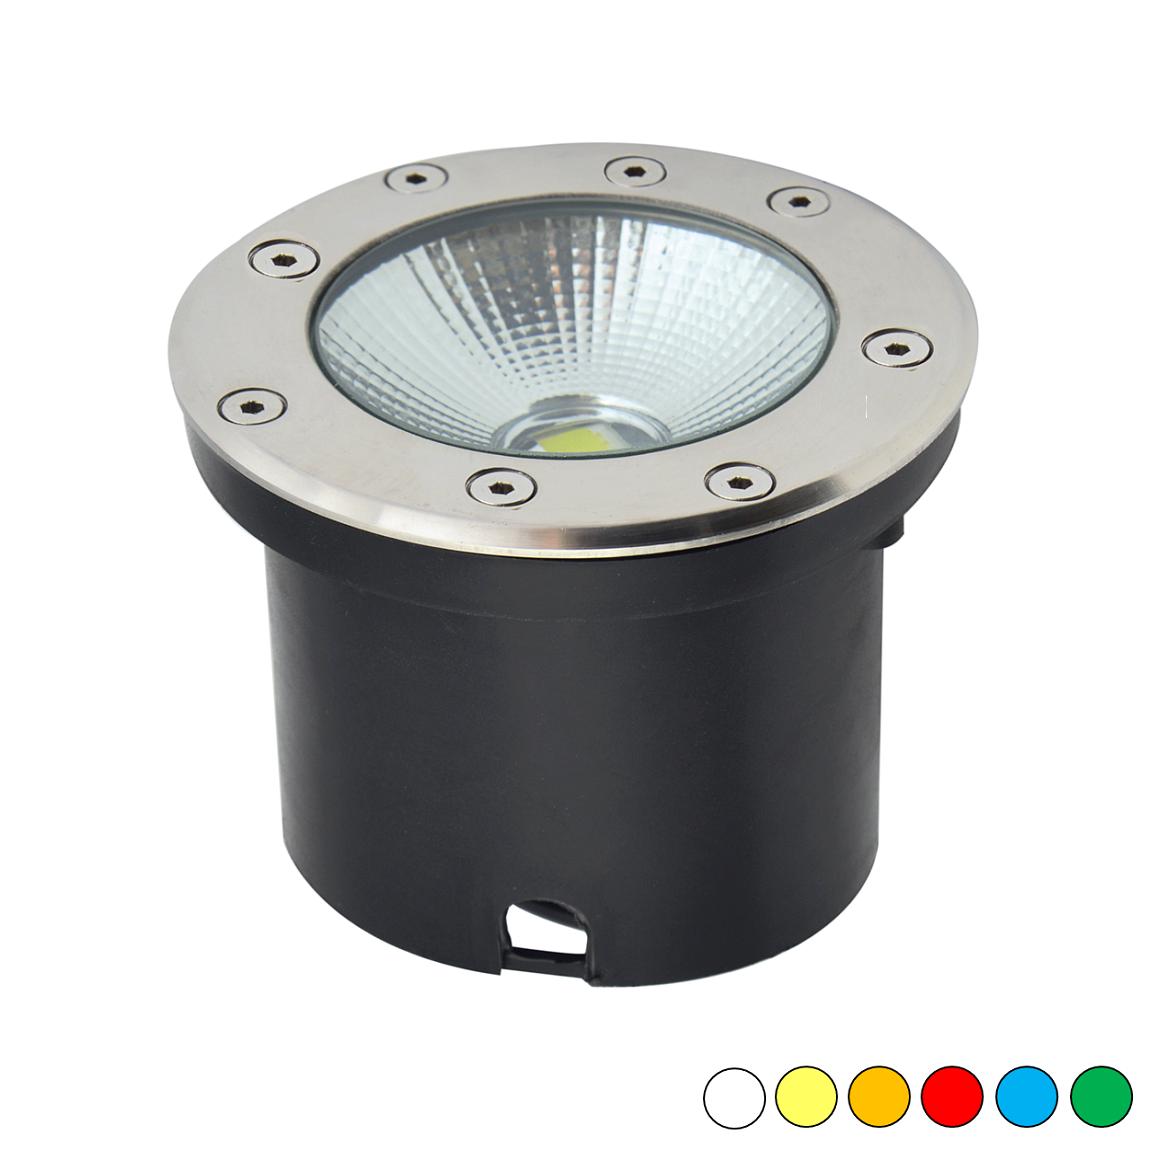 FORLIFE FL-2094 - 6 Watt Sıva Altı LED Wallwasher